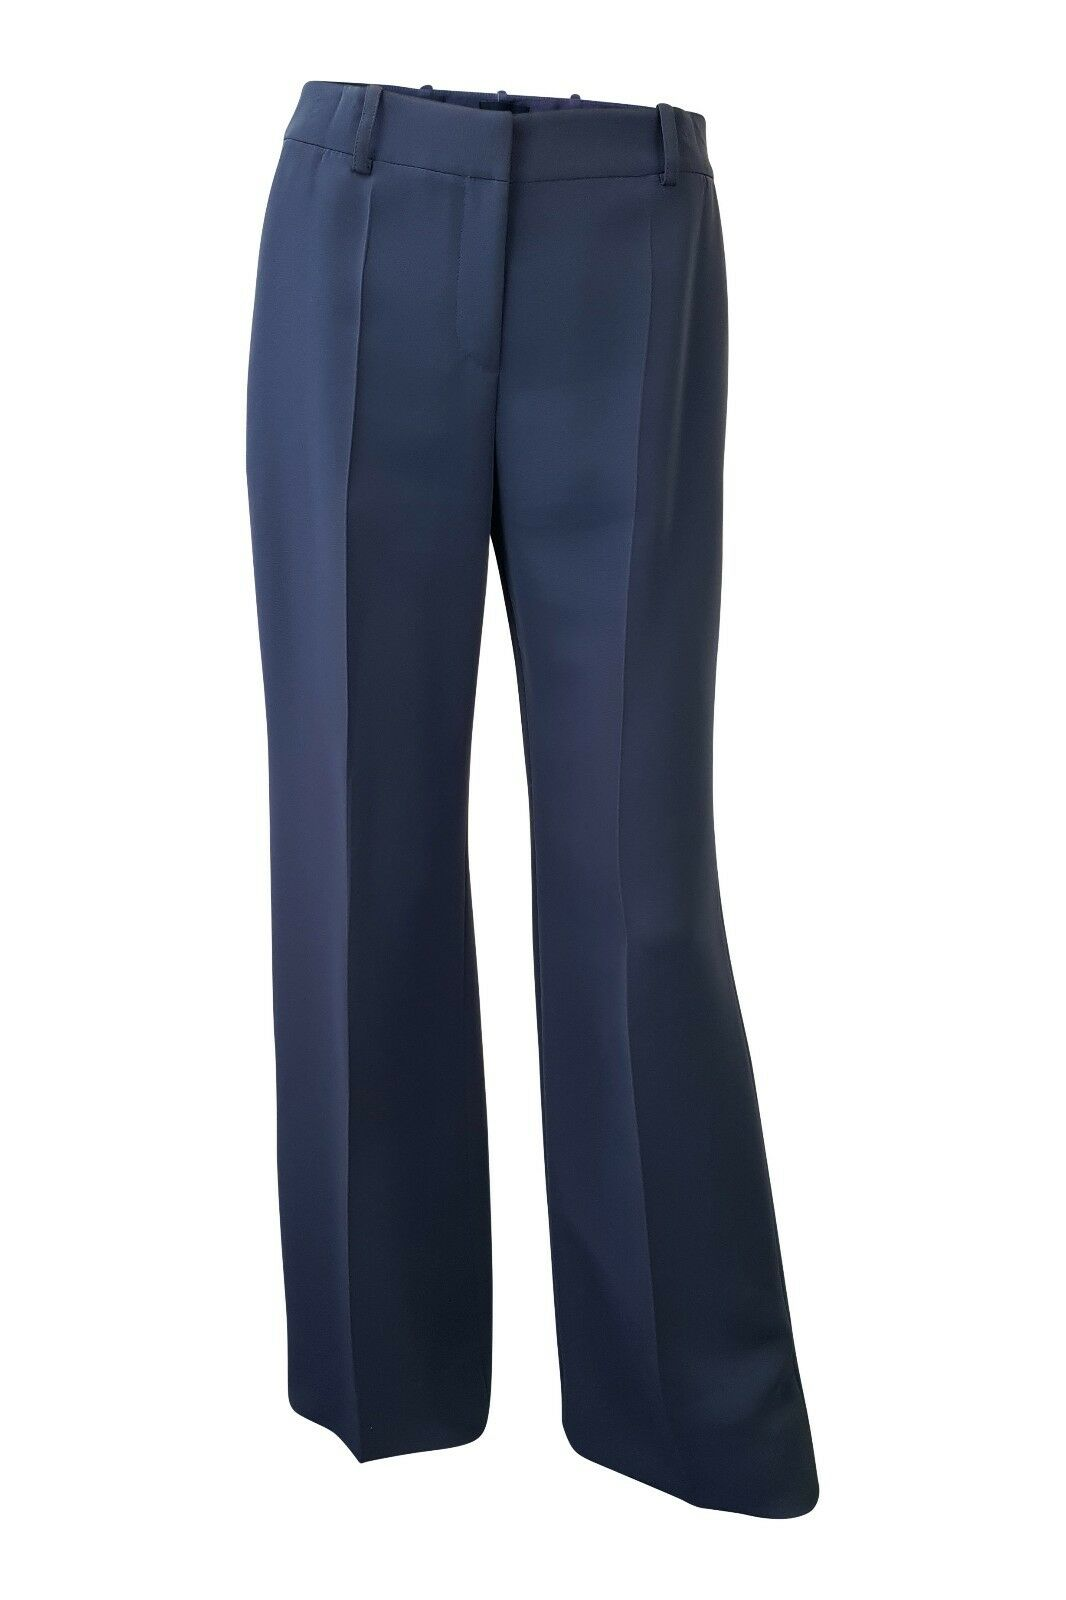 GIORGIO ARMANI TAILORED blueE GREY STRAIGHT LEG TROUSERS (40)